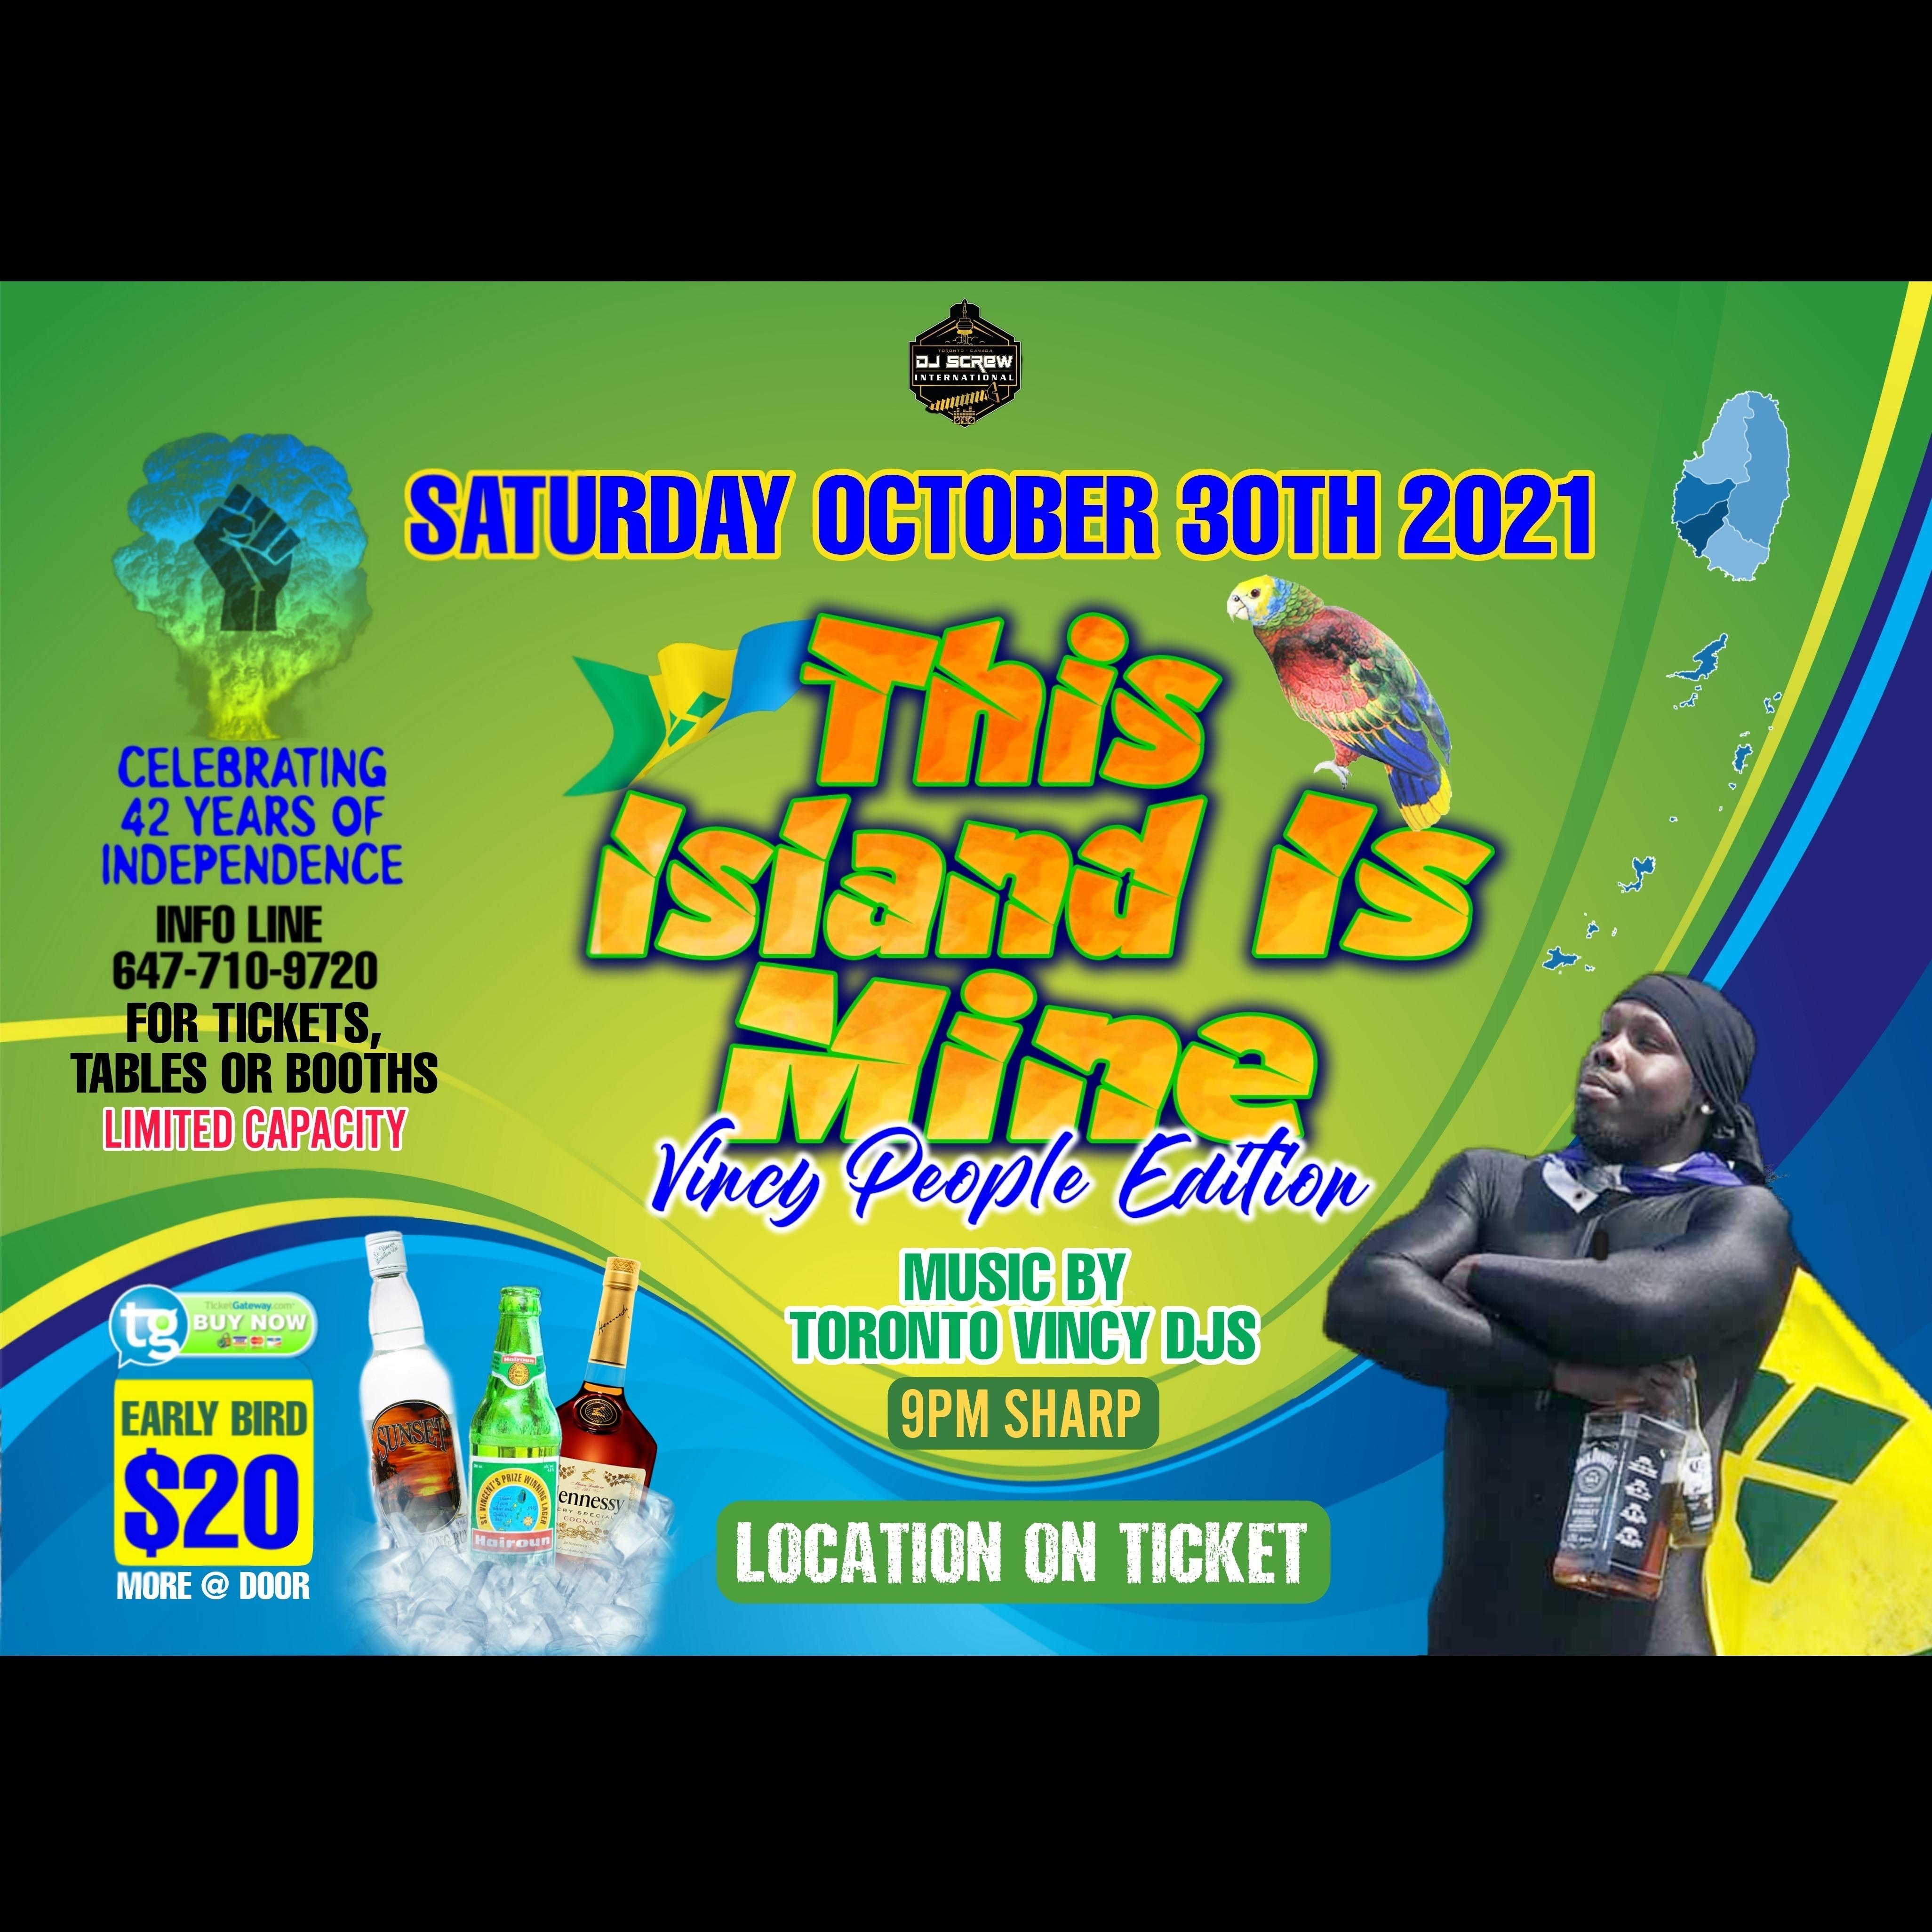 THIS ISLAND IS MINE